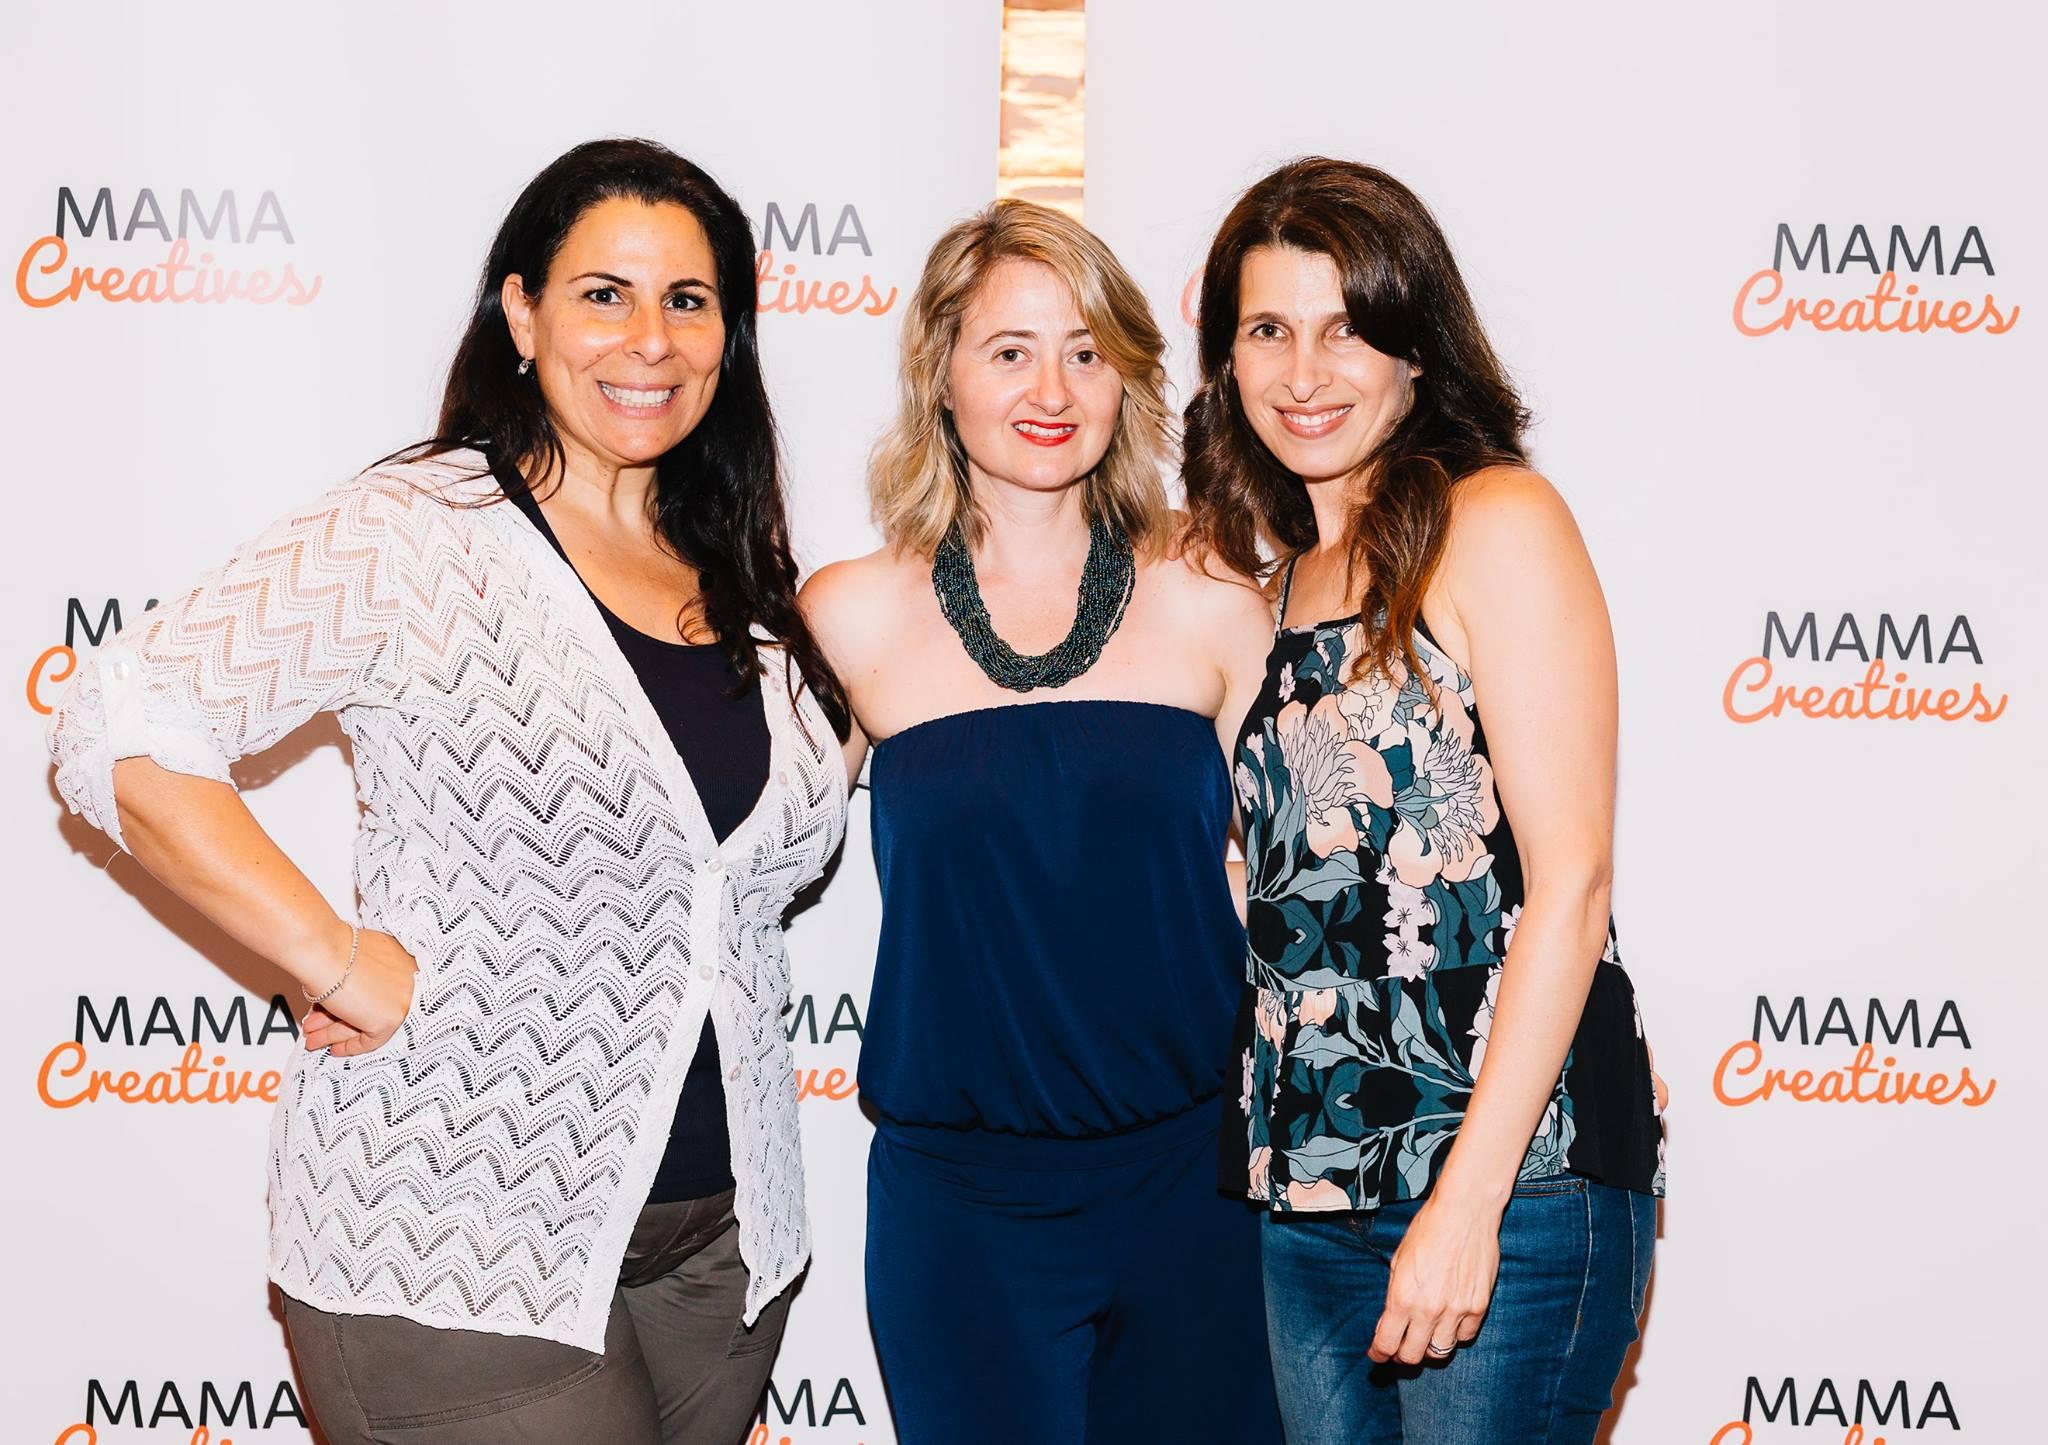 Here with amazing women, Esther Labi, Anna Kellerman and Nadine Ben-Mayor.